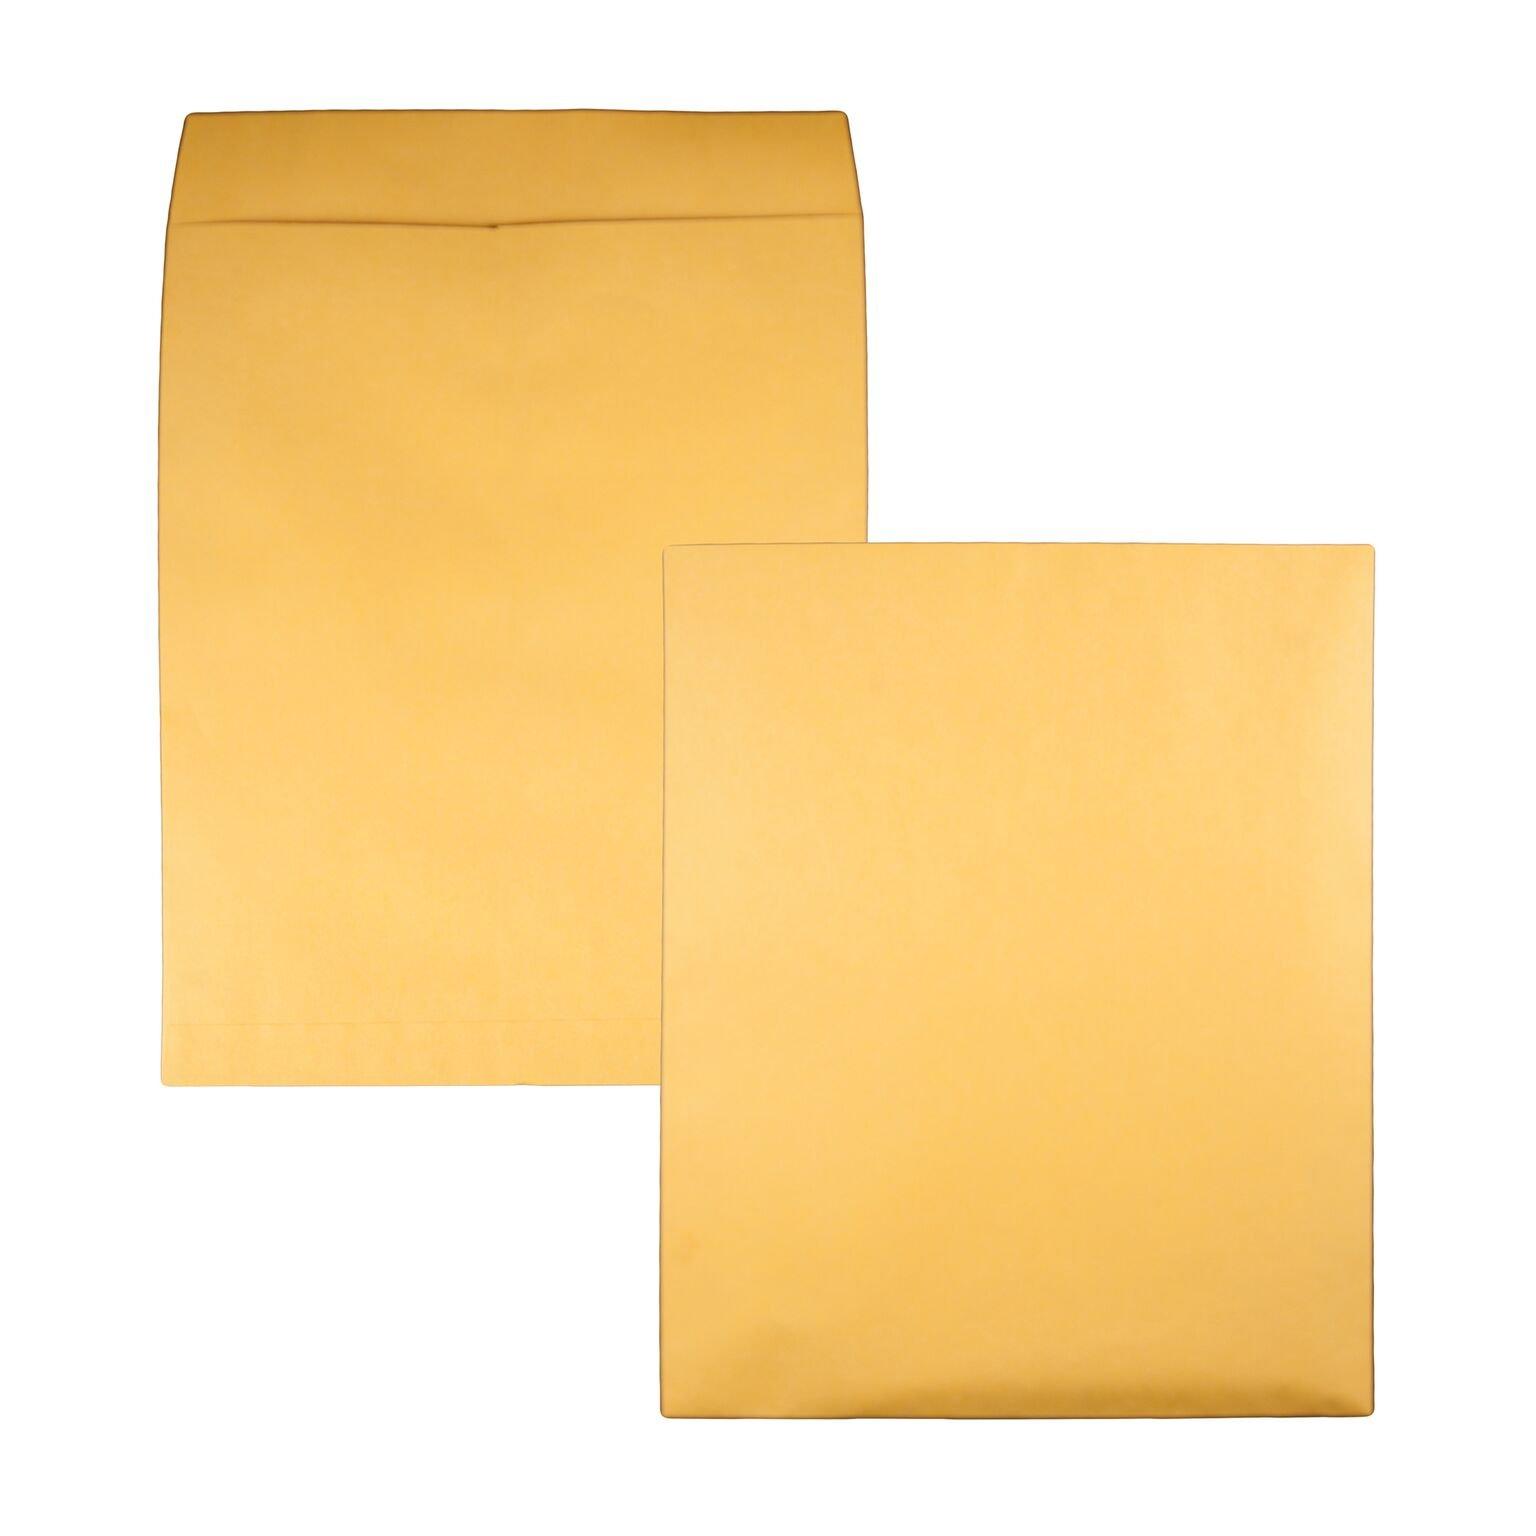 Quality Park,Jumbo Kraft Envelopes, Ungummed, Brown Kraft, 14x18, 25 per box (42354)